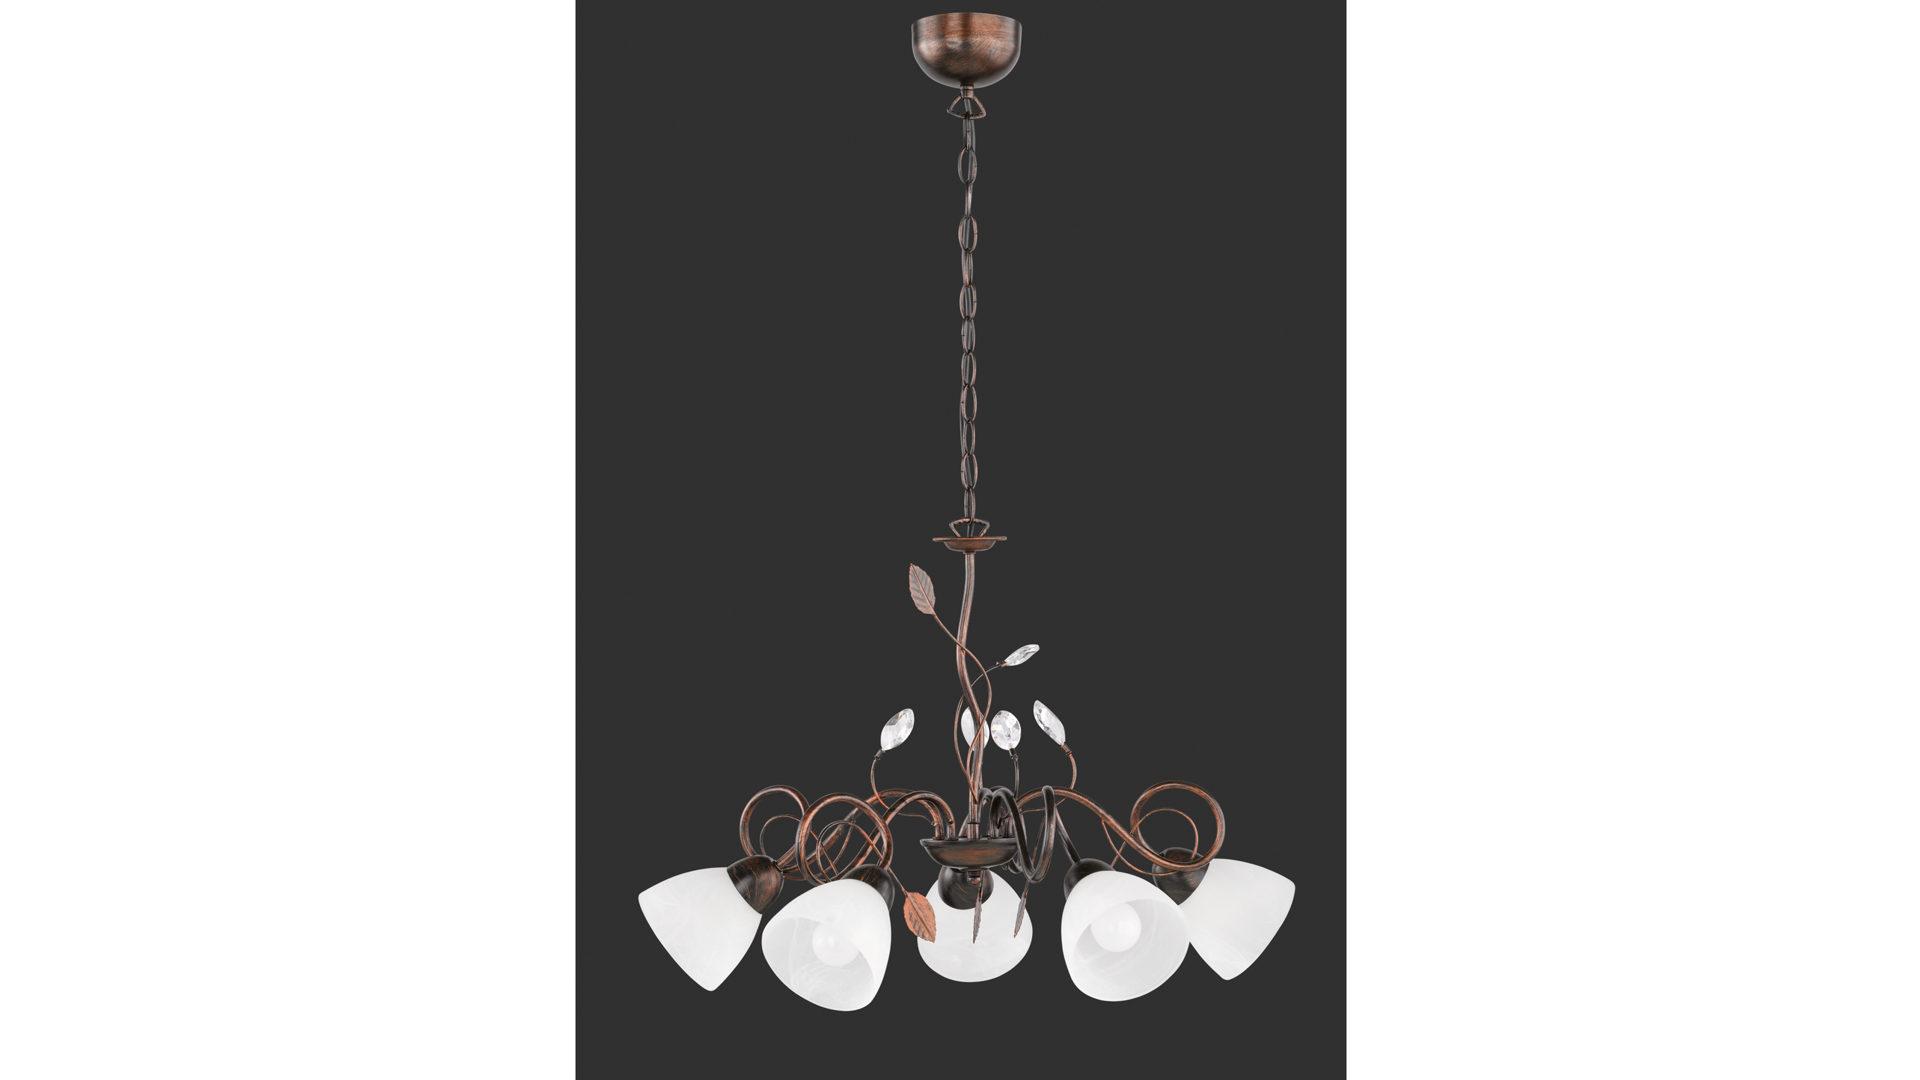 Kronleuchter Trio ~ Kronleuchter antik rostfarbenes metall u fünf lampenschirme bad